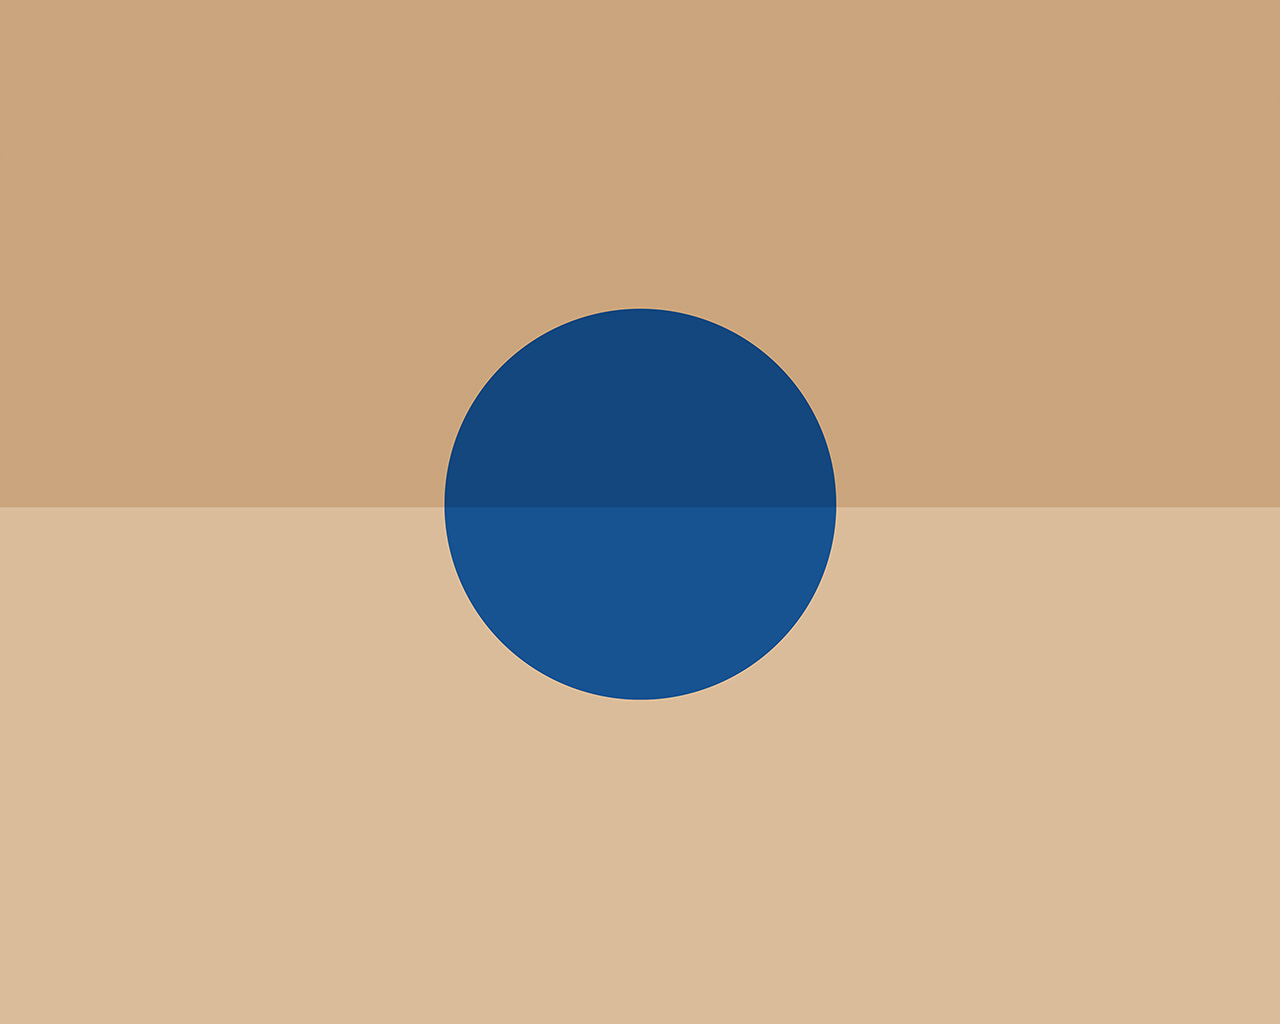 Ar39 minimal tycho art blue sun yellow illustration wallpaper for Minimal art essay